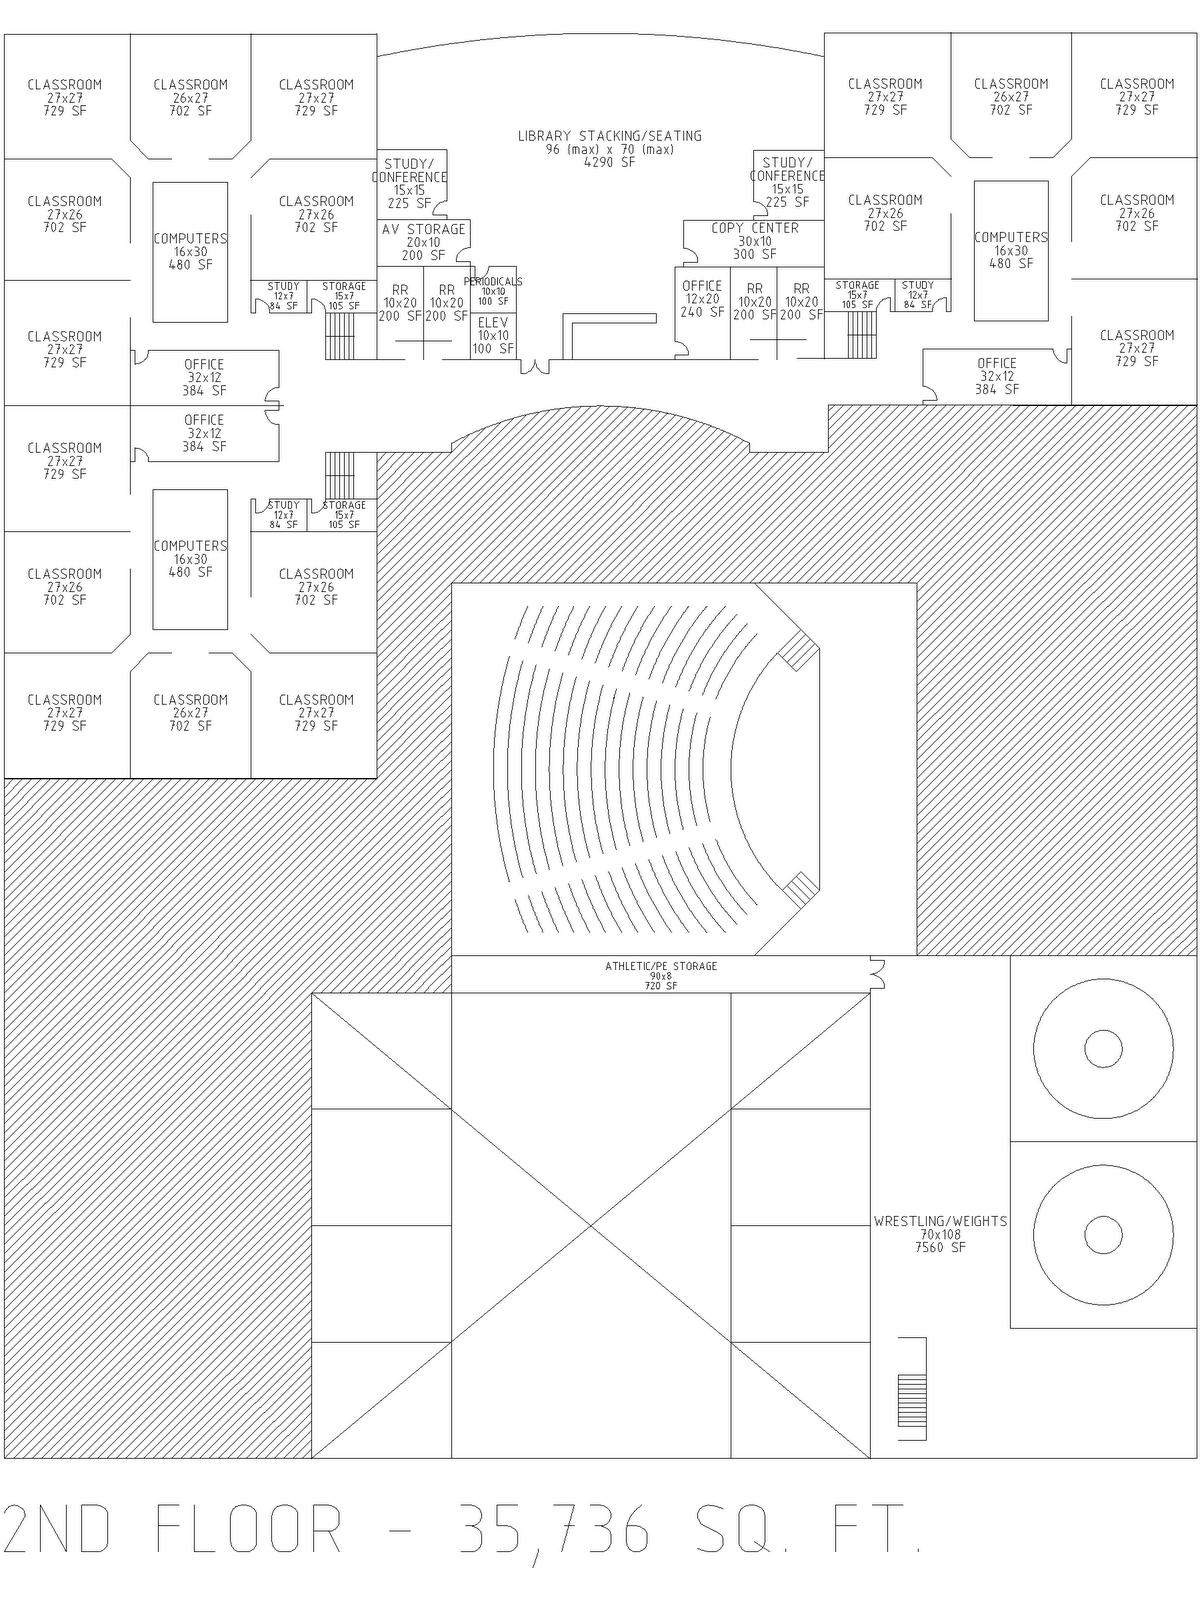 Gym Floor Locker Rooms